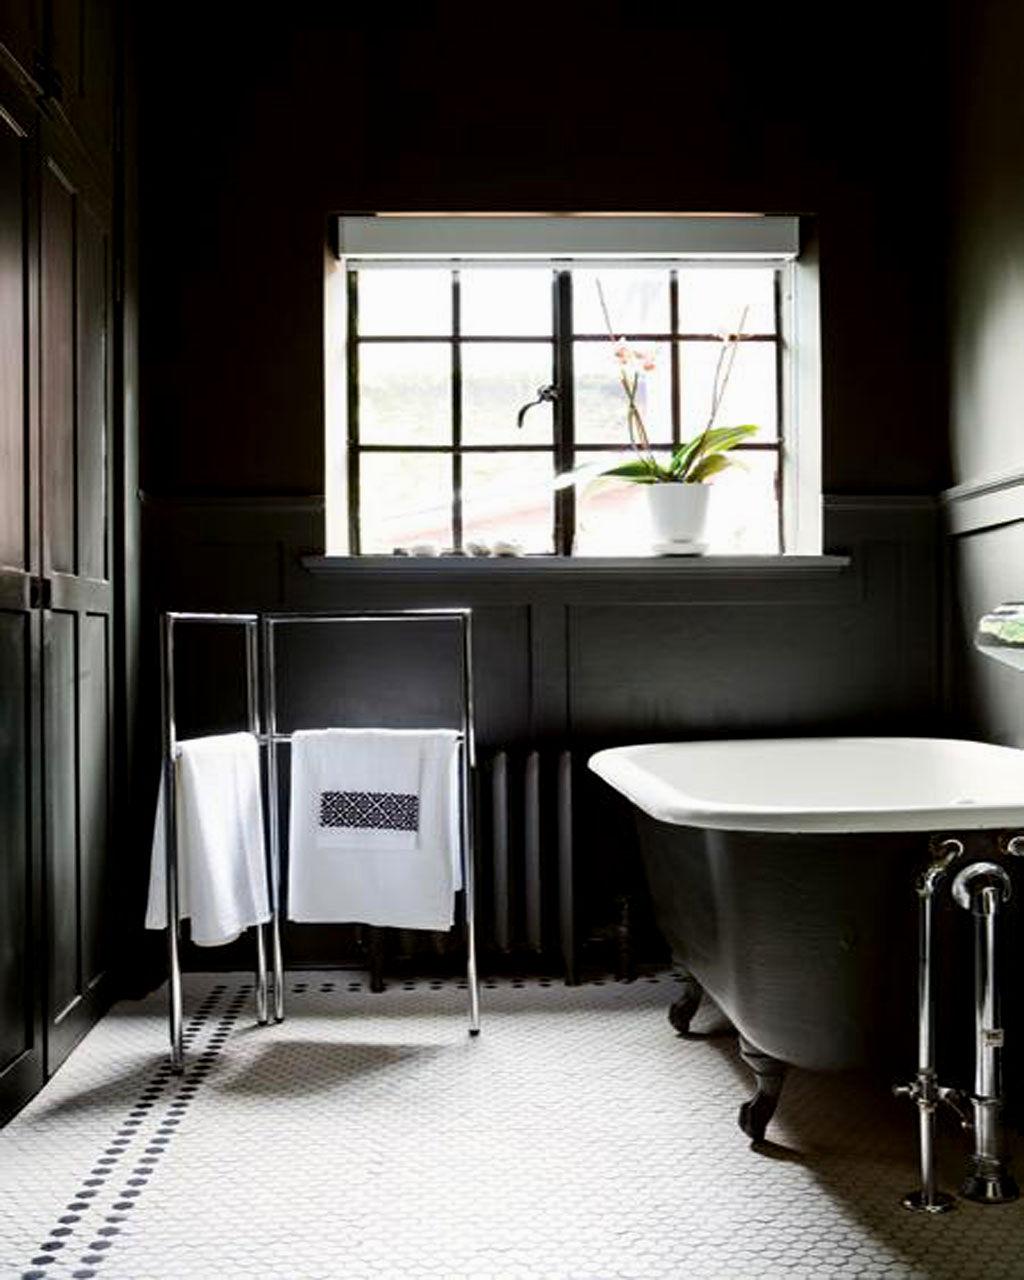 finest white bathroom vanities architecture-Luxury White Bathroom Vanities Image